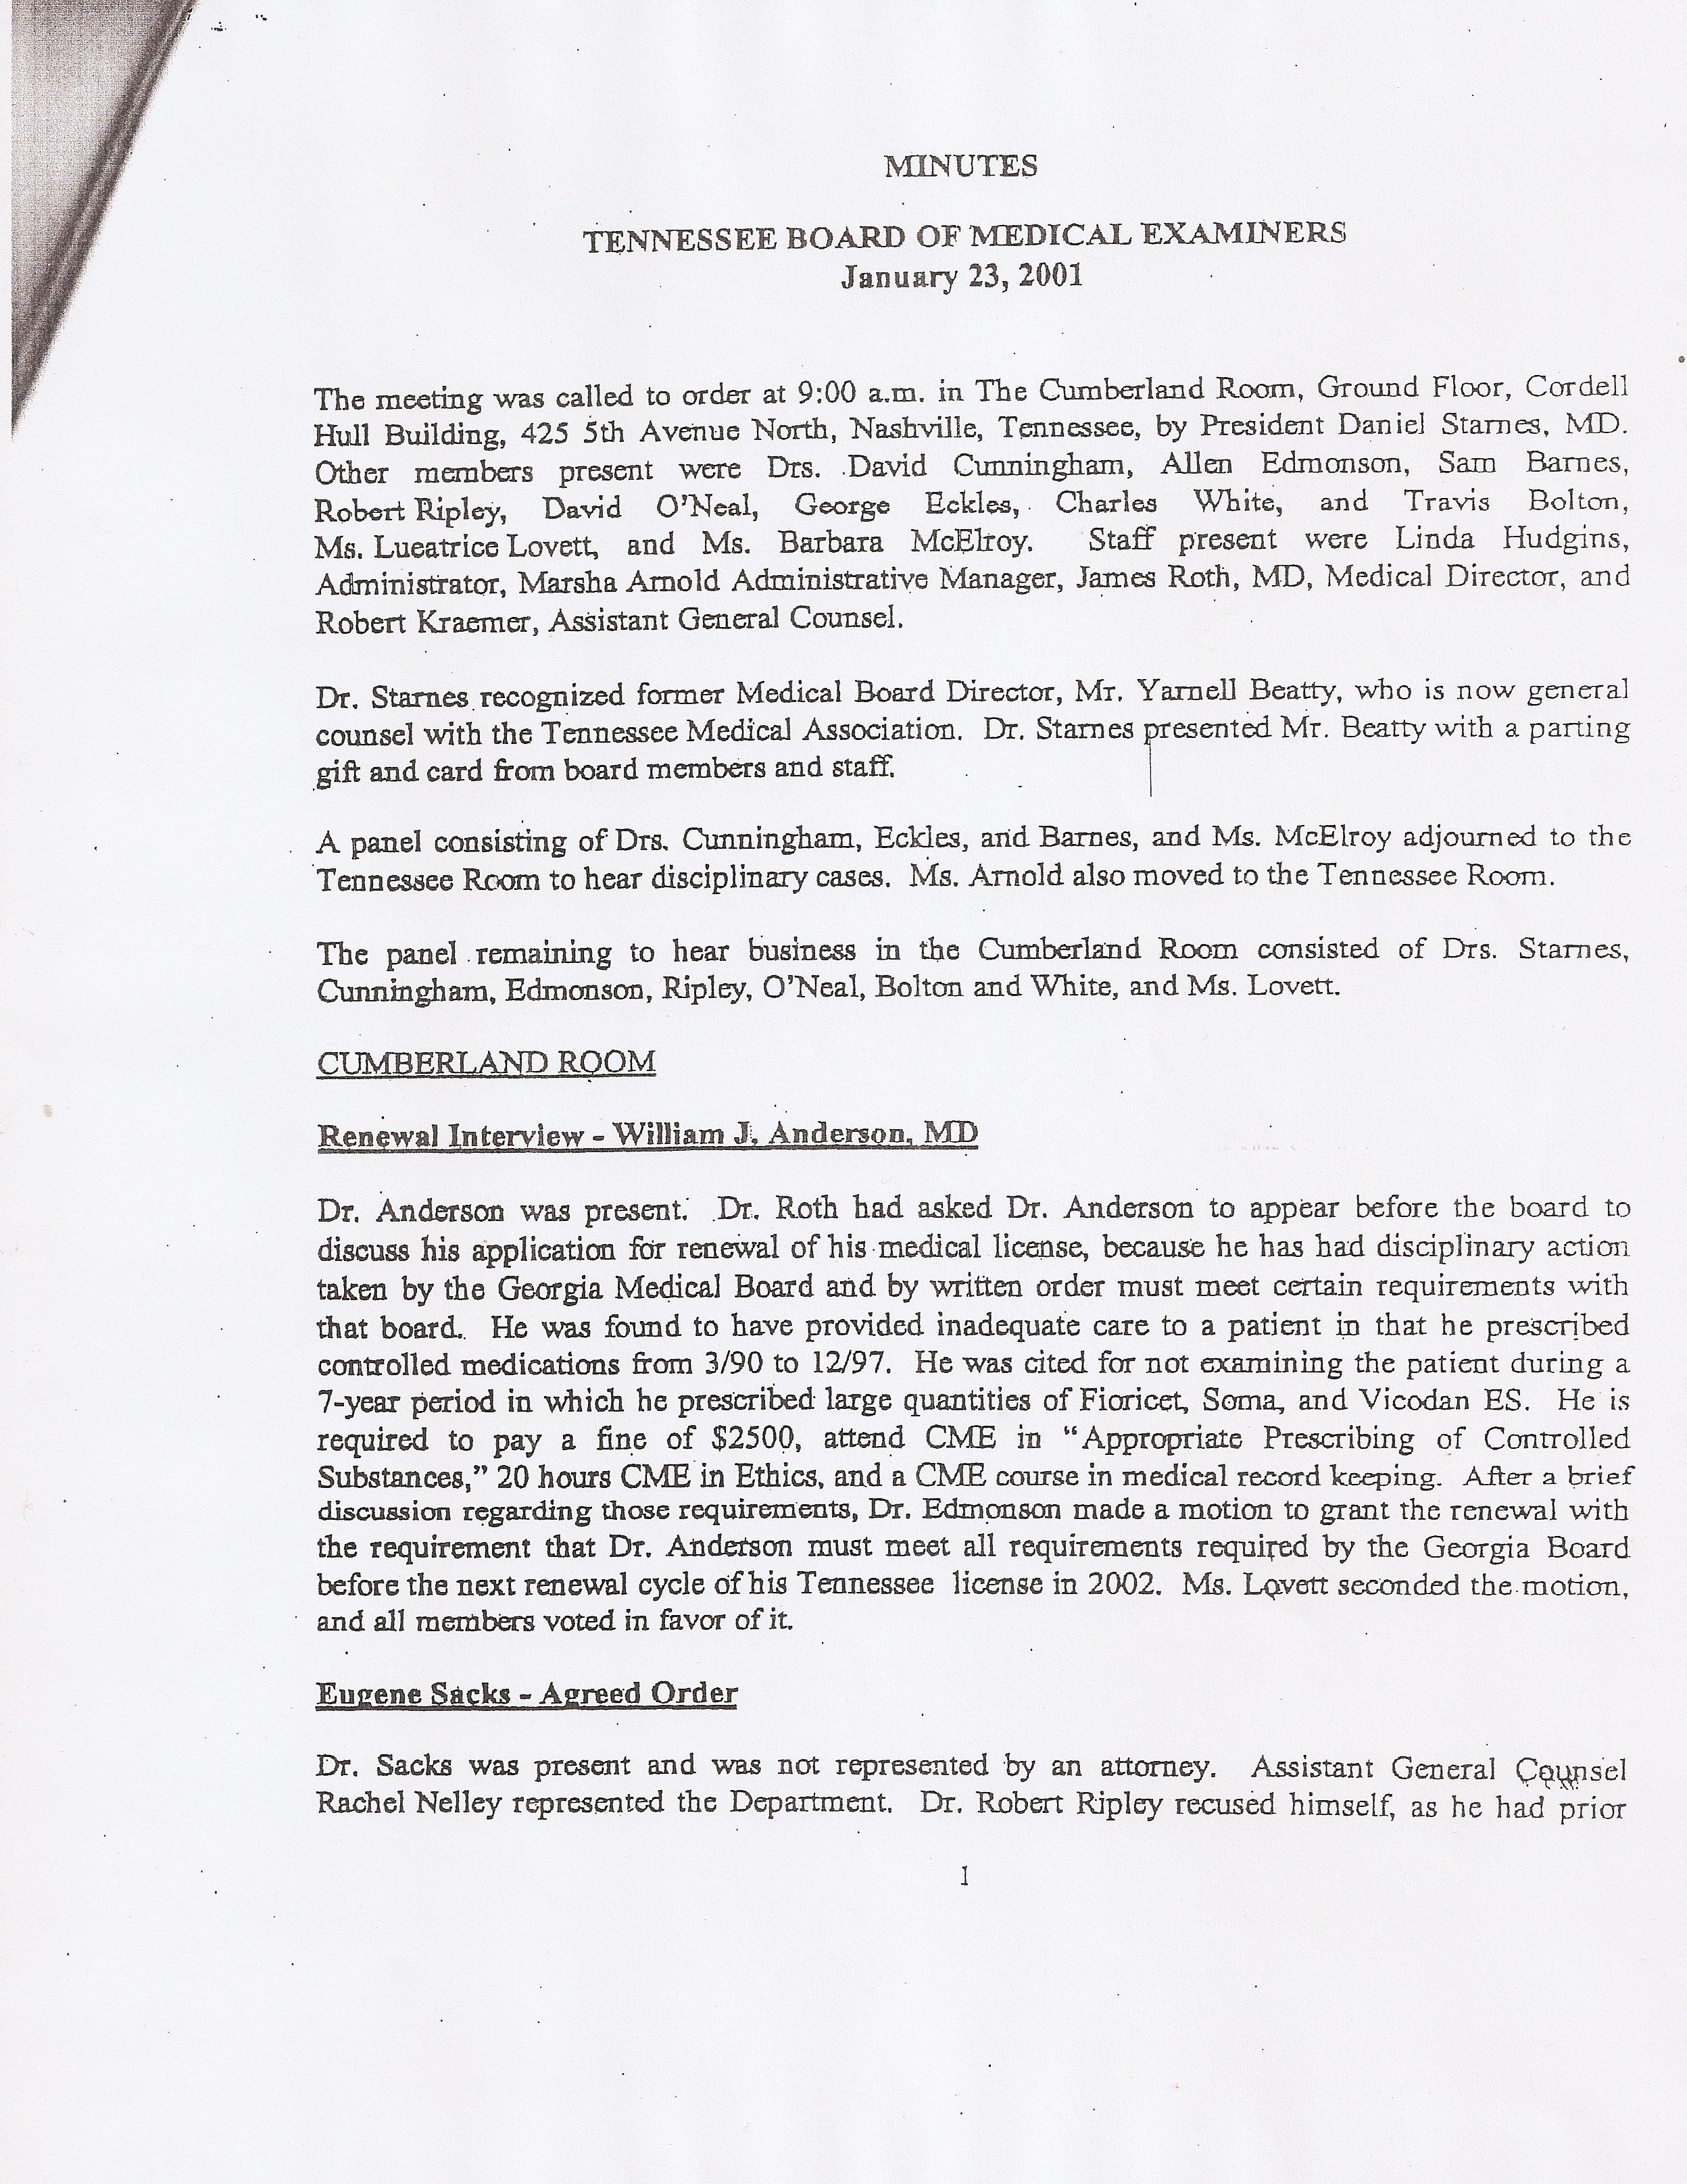 Title Cover Letter Hedis Nurse Cover Letter Medical Practice - Plans examiner cover letter